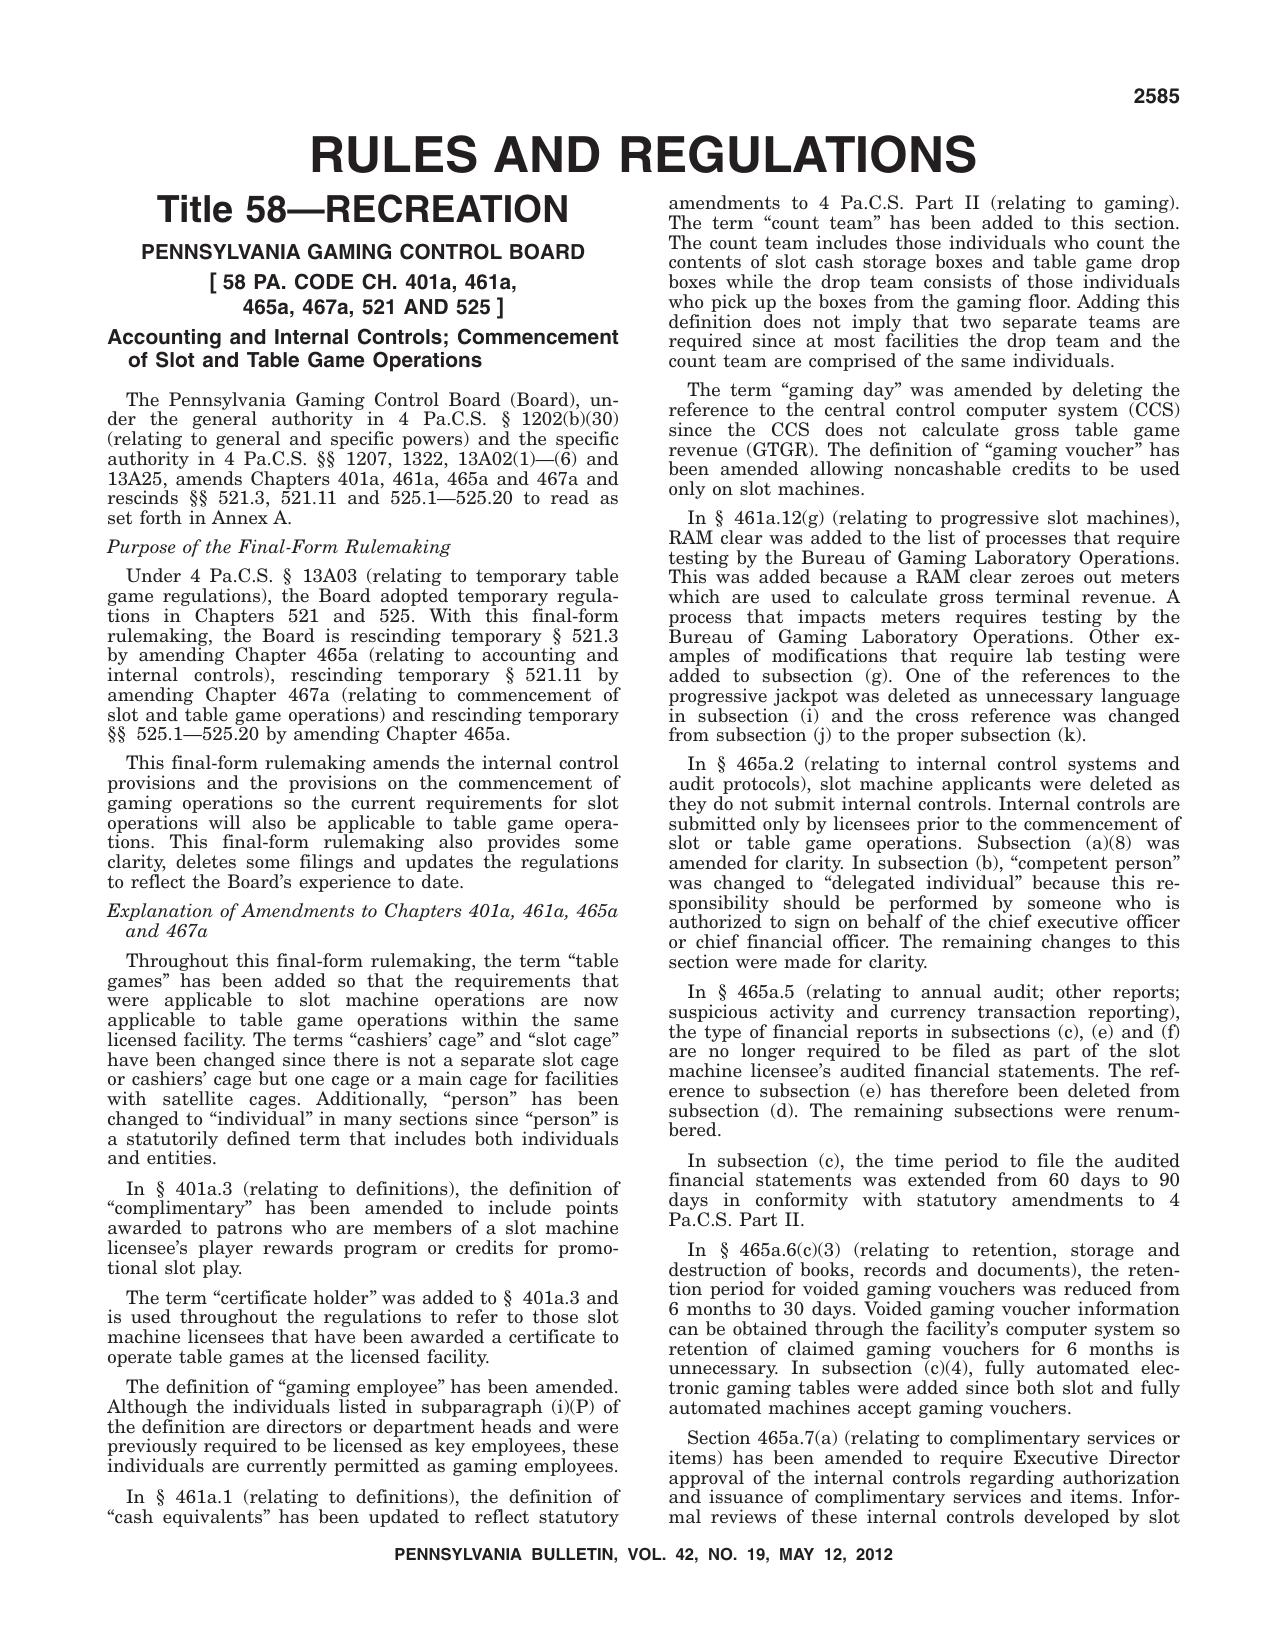 Pa Bulletin - Pennsylvania Bulletin Online